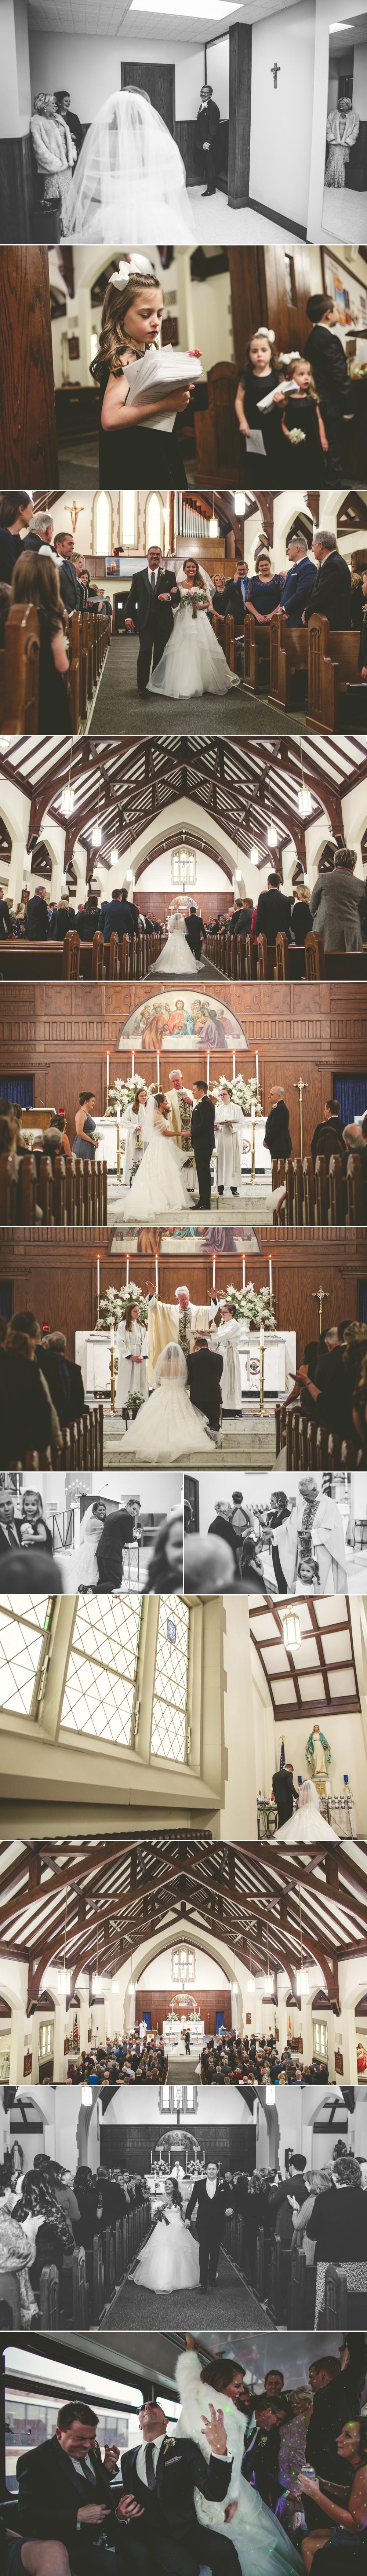 jason_domingues_photography_best_kansas_city_wedding_photographer_kc_weddings_garment_house_0002.JPG